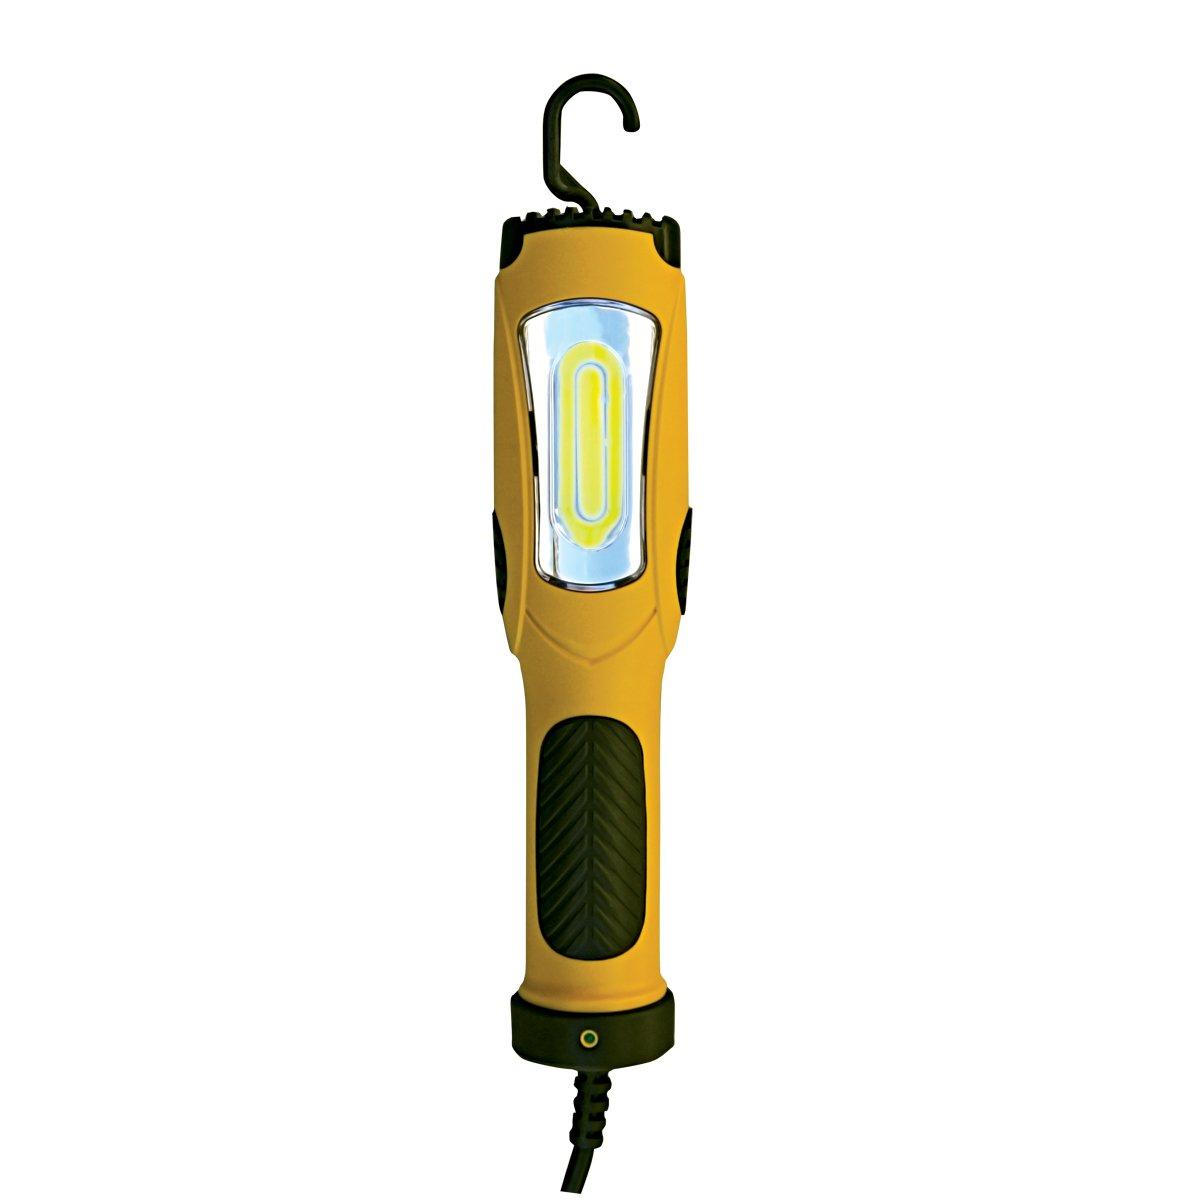 Voltec 08-00627 8W 500 Lumens COB LED Handheld Work Light by Voltec